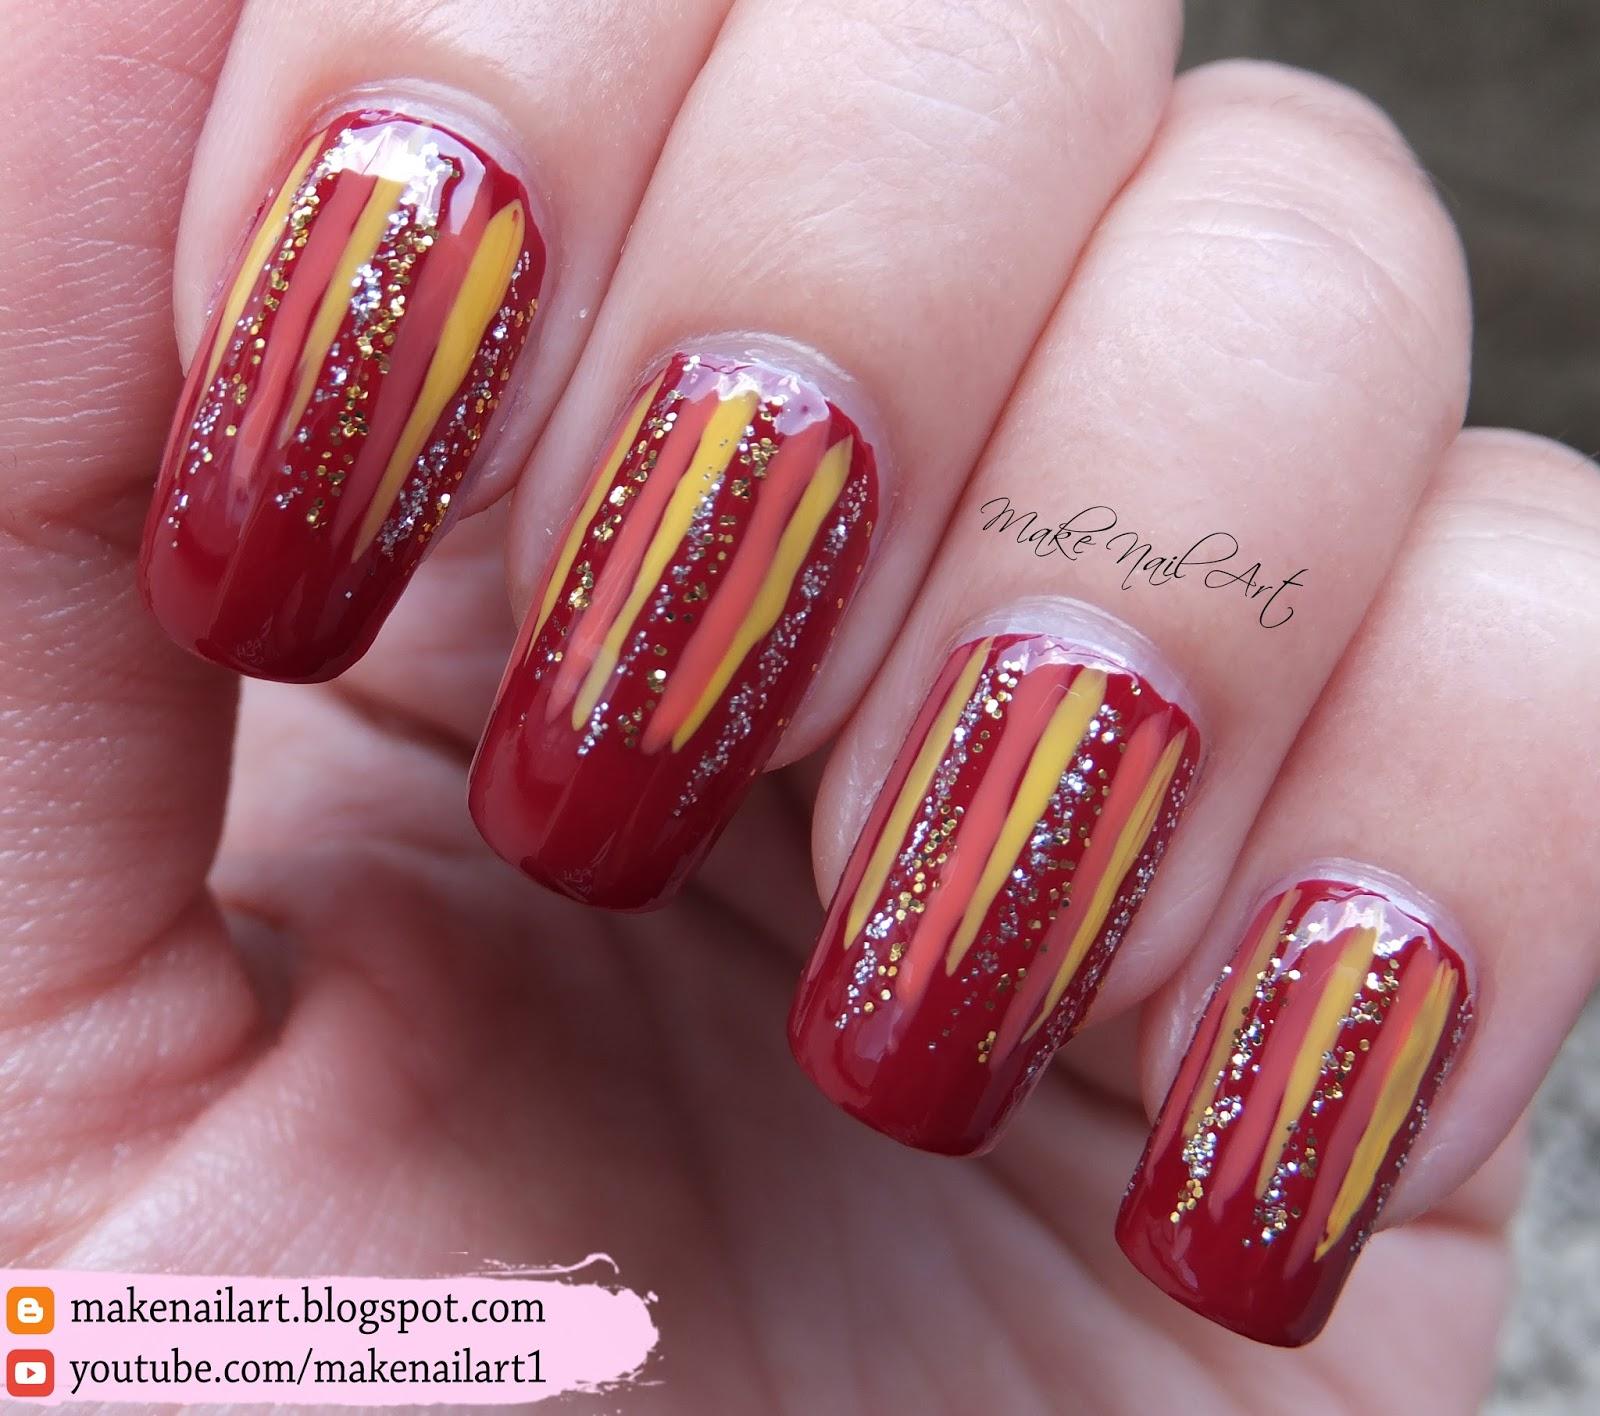 Make Nail Art: Autumn Glitter Waterfall Nail Art Design ...